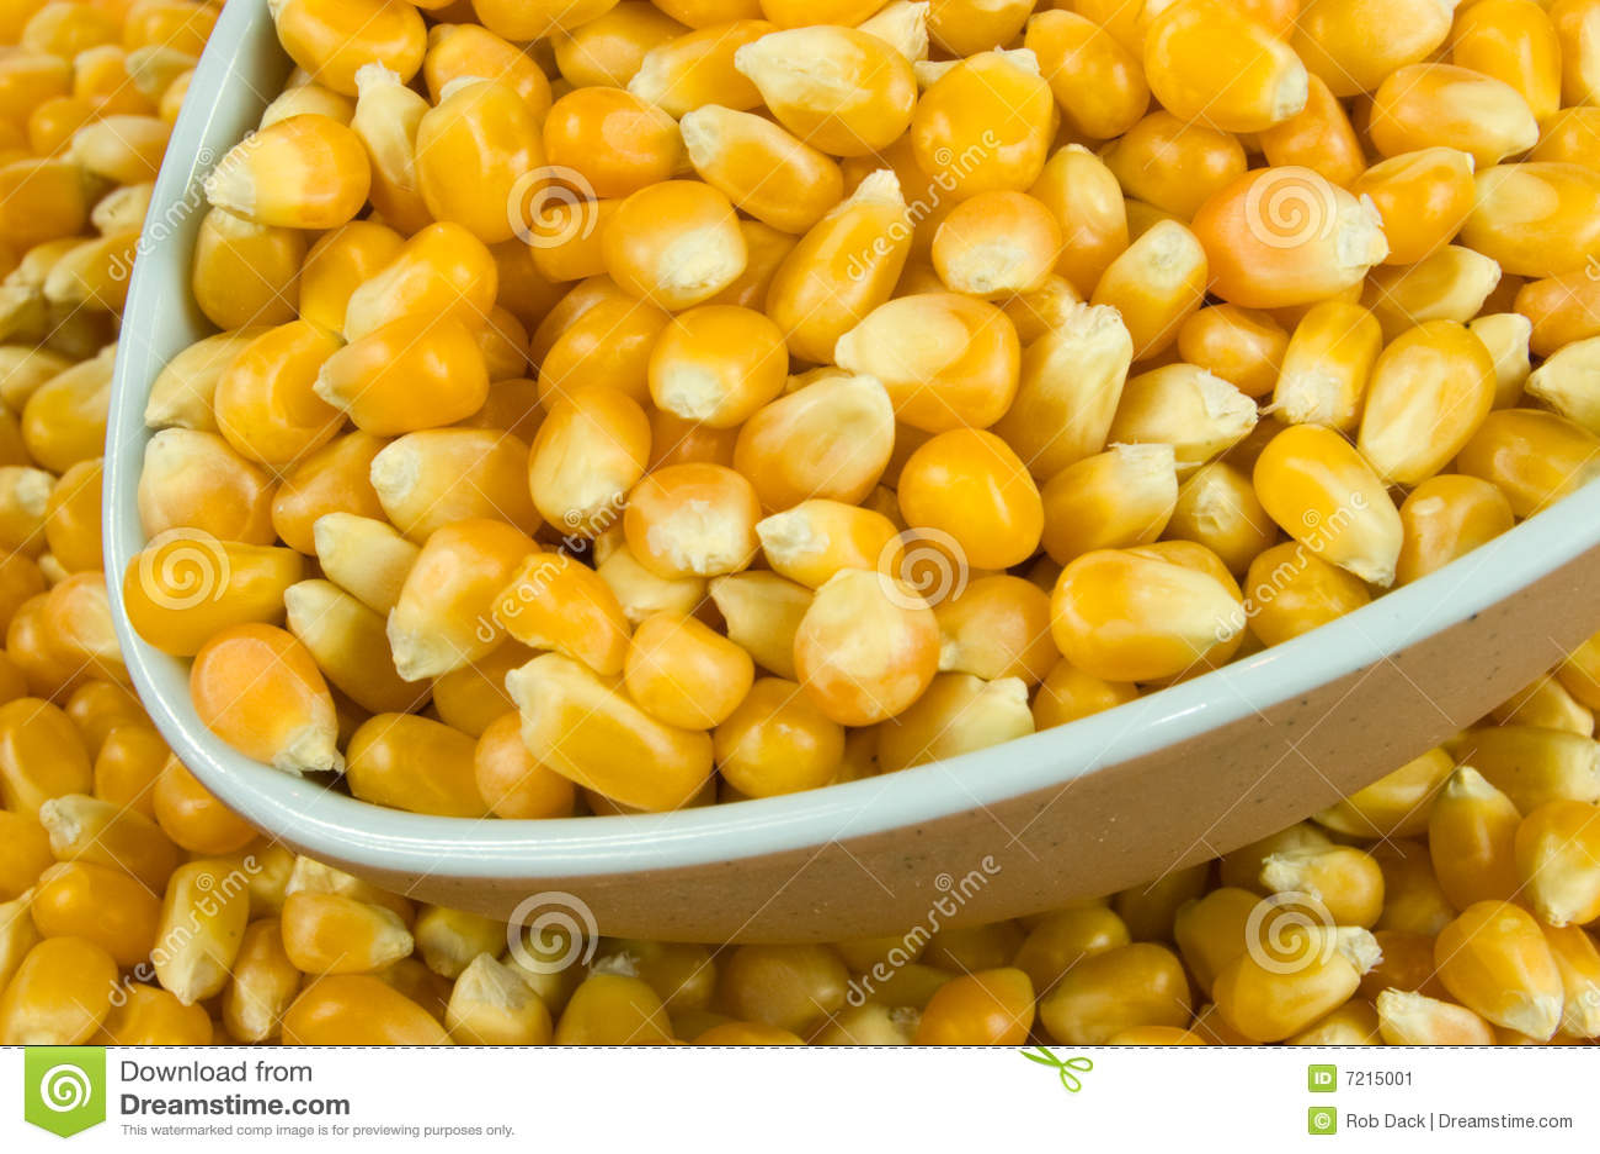 how to cook popcorn kernels